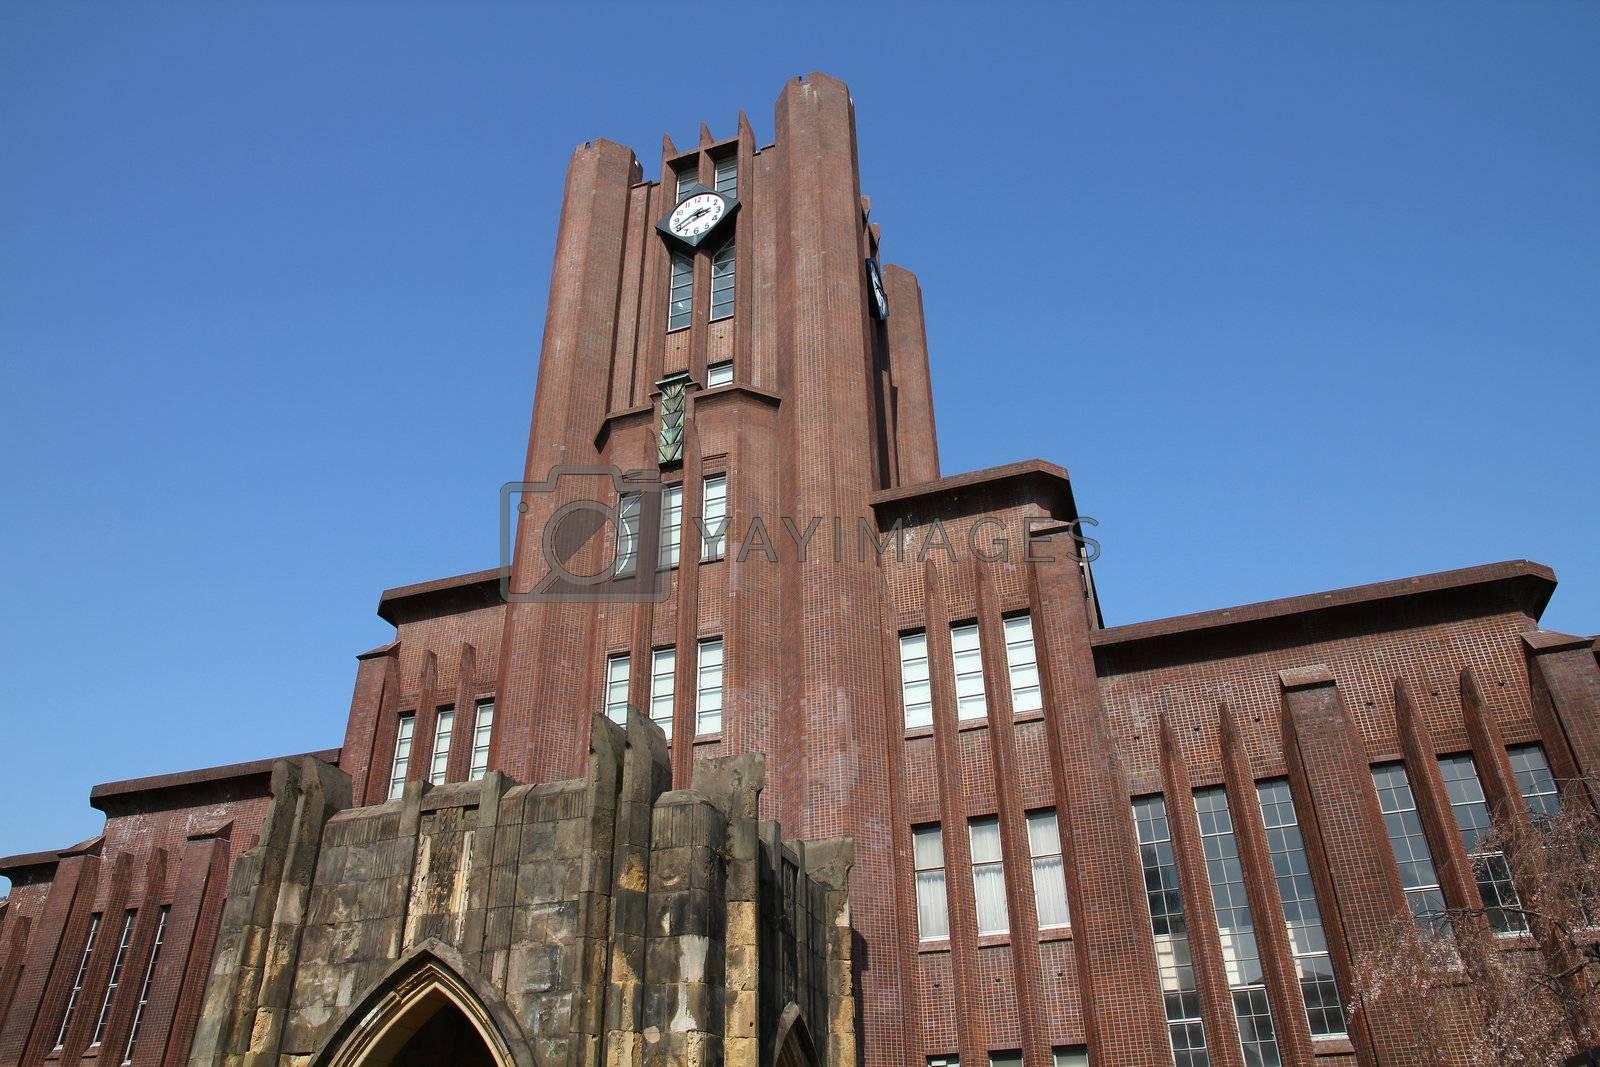 Tokyo, Japan - famous Yasuda Auditorium of Tokyo University